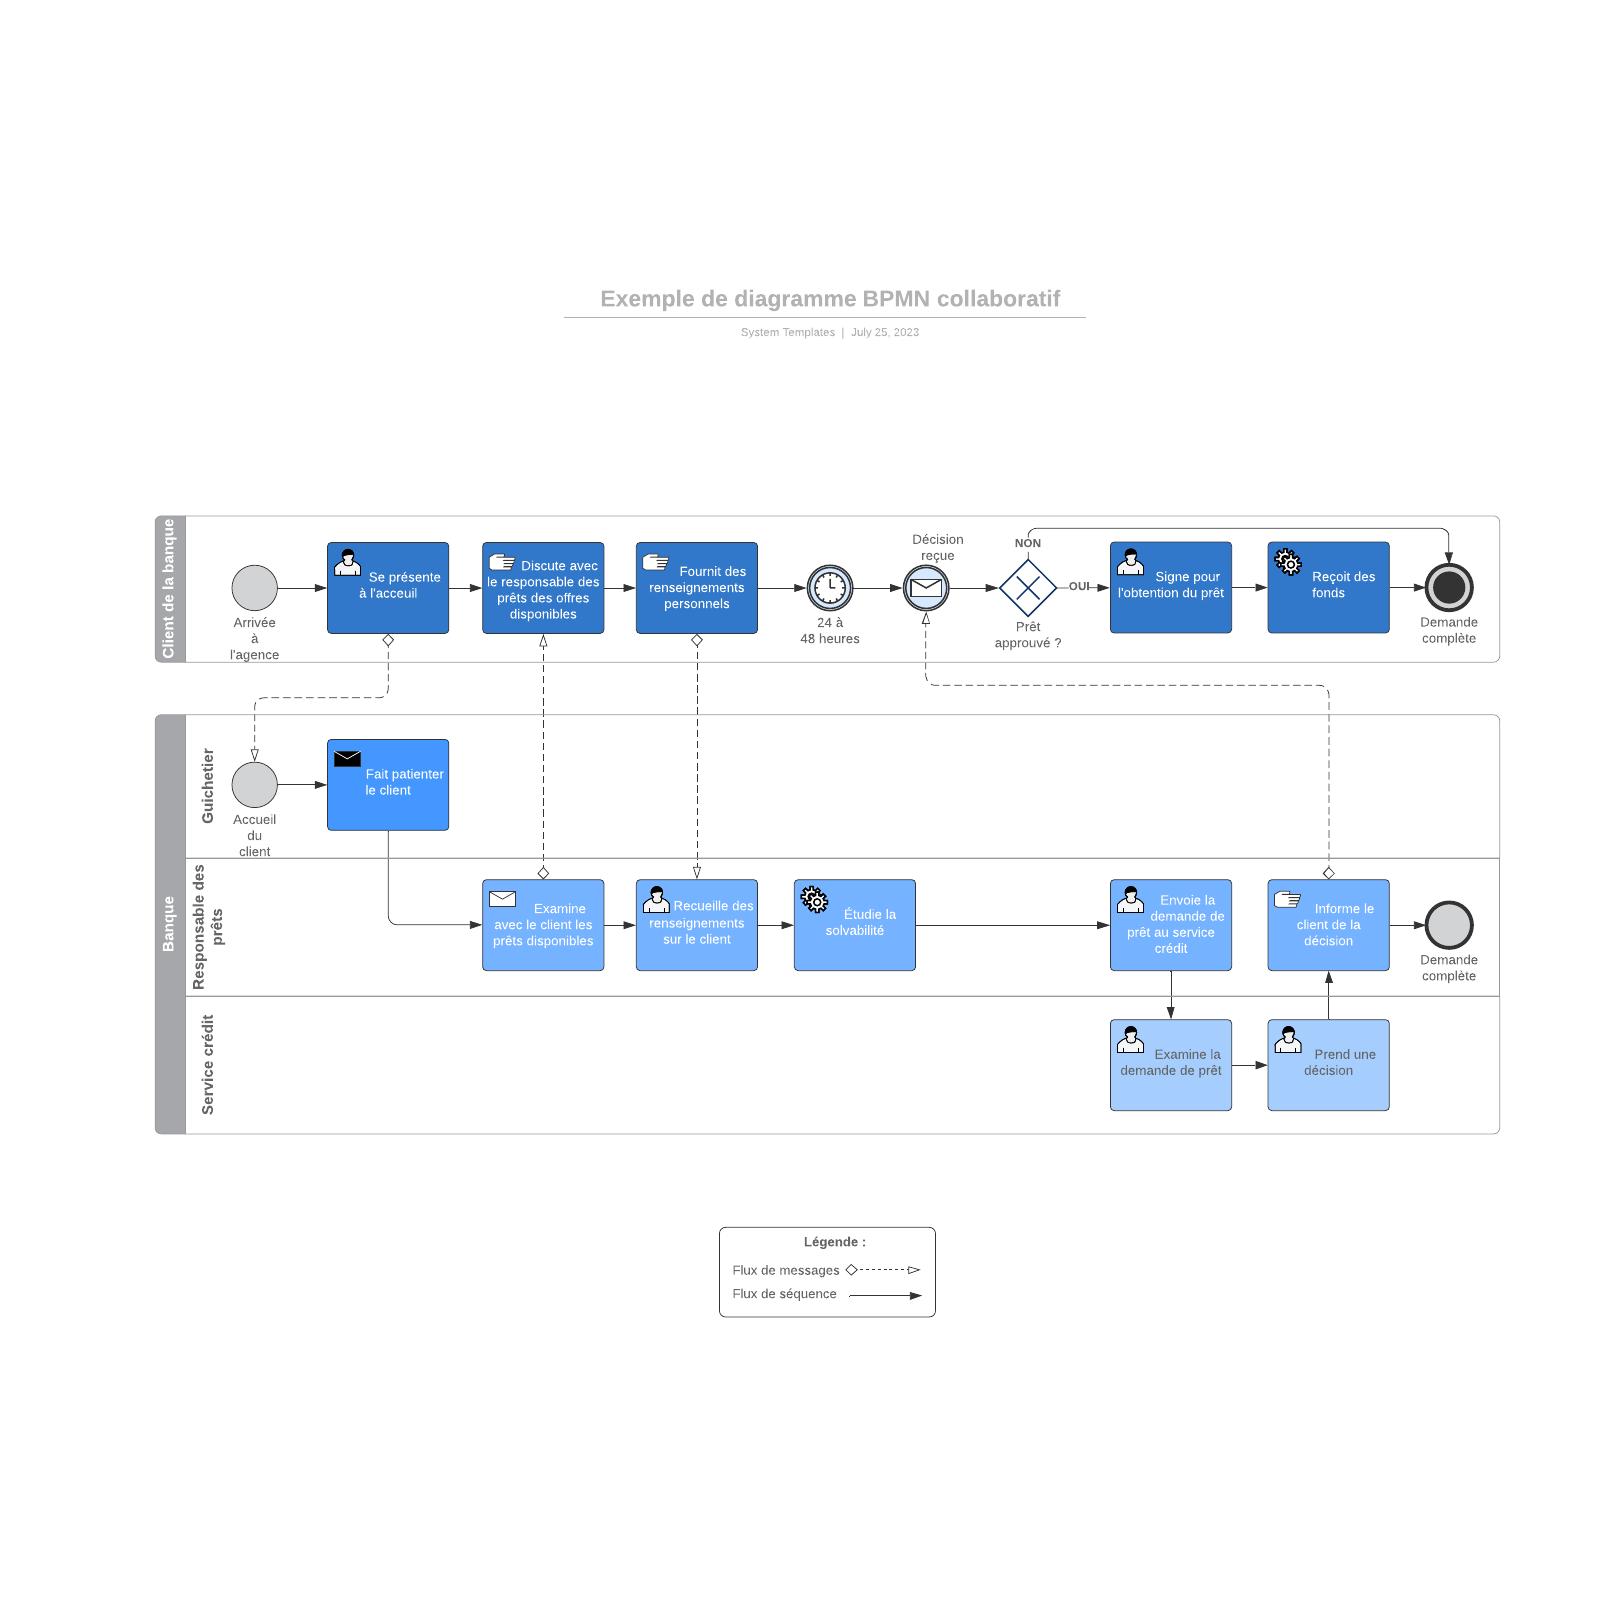 exemple de diagramme BPMN collaboratif